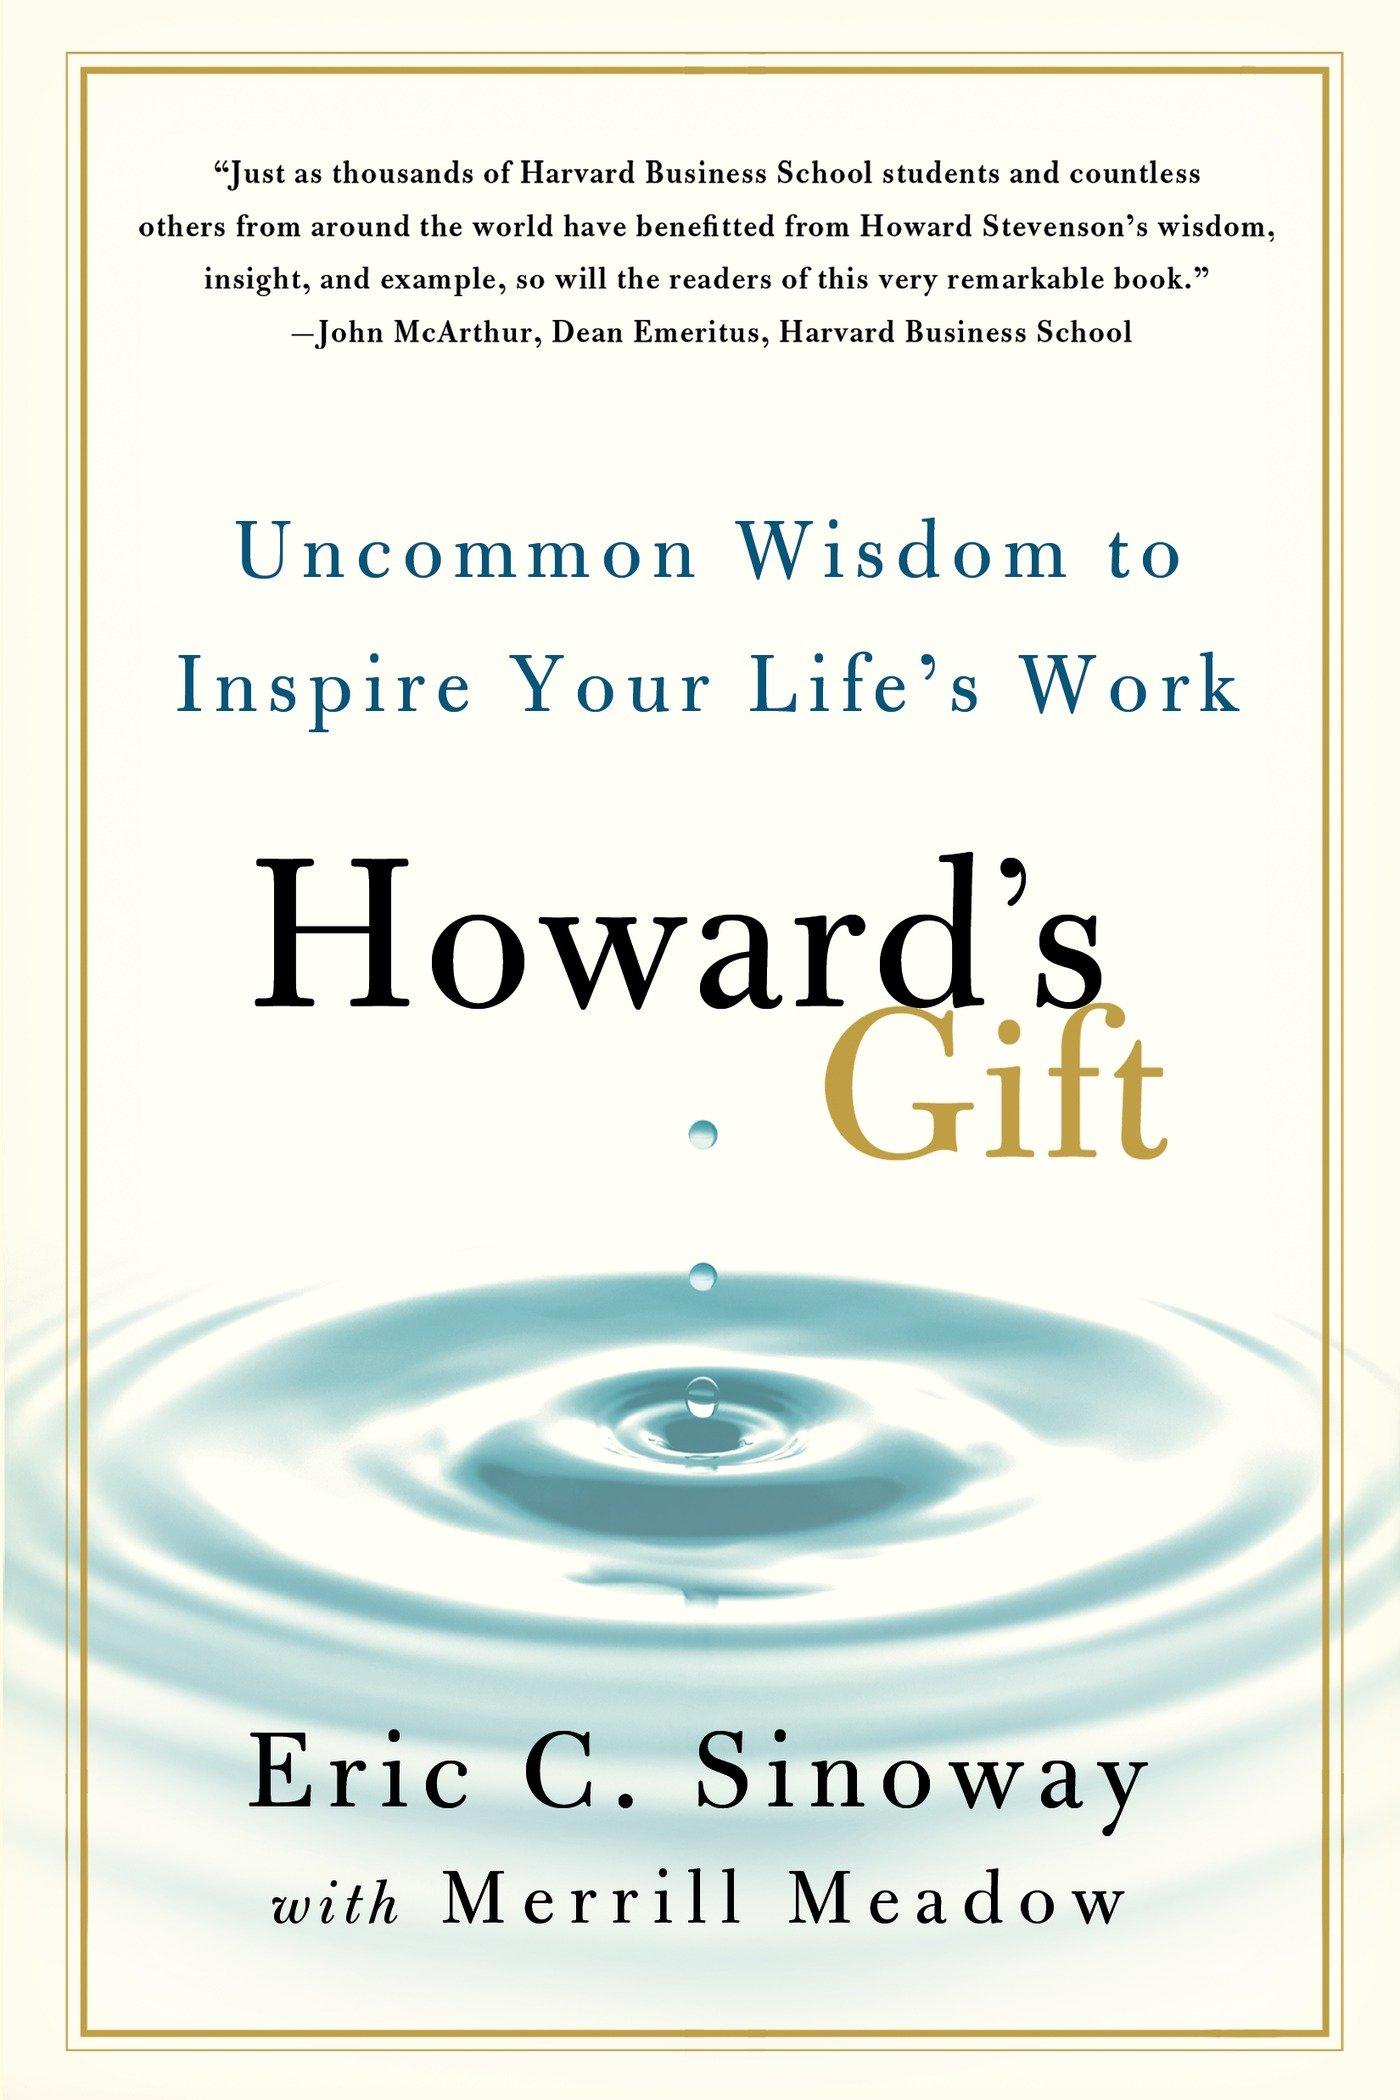 Howards Gift Uncommon Wisdom Inspire